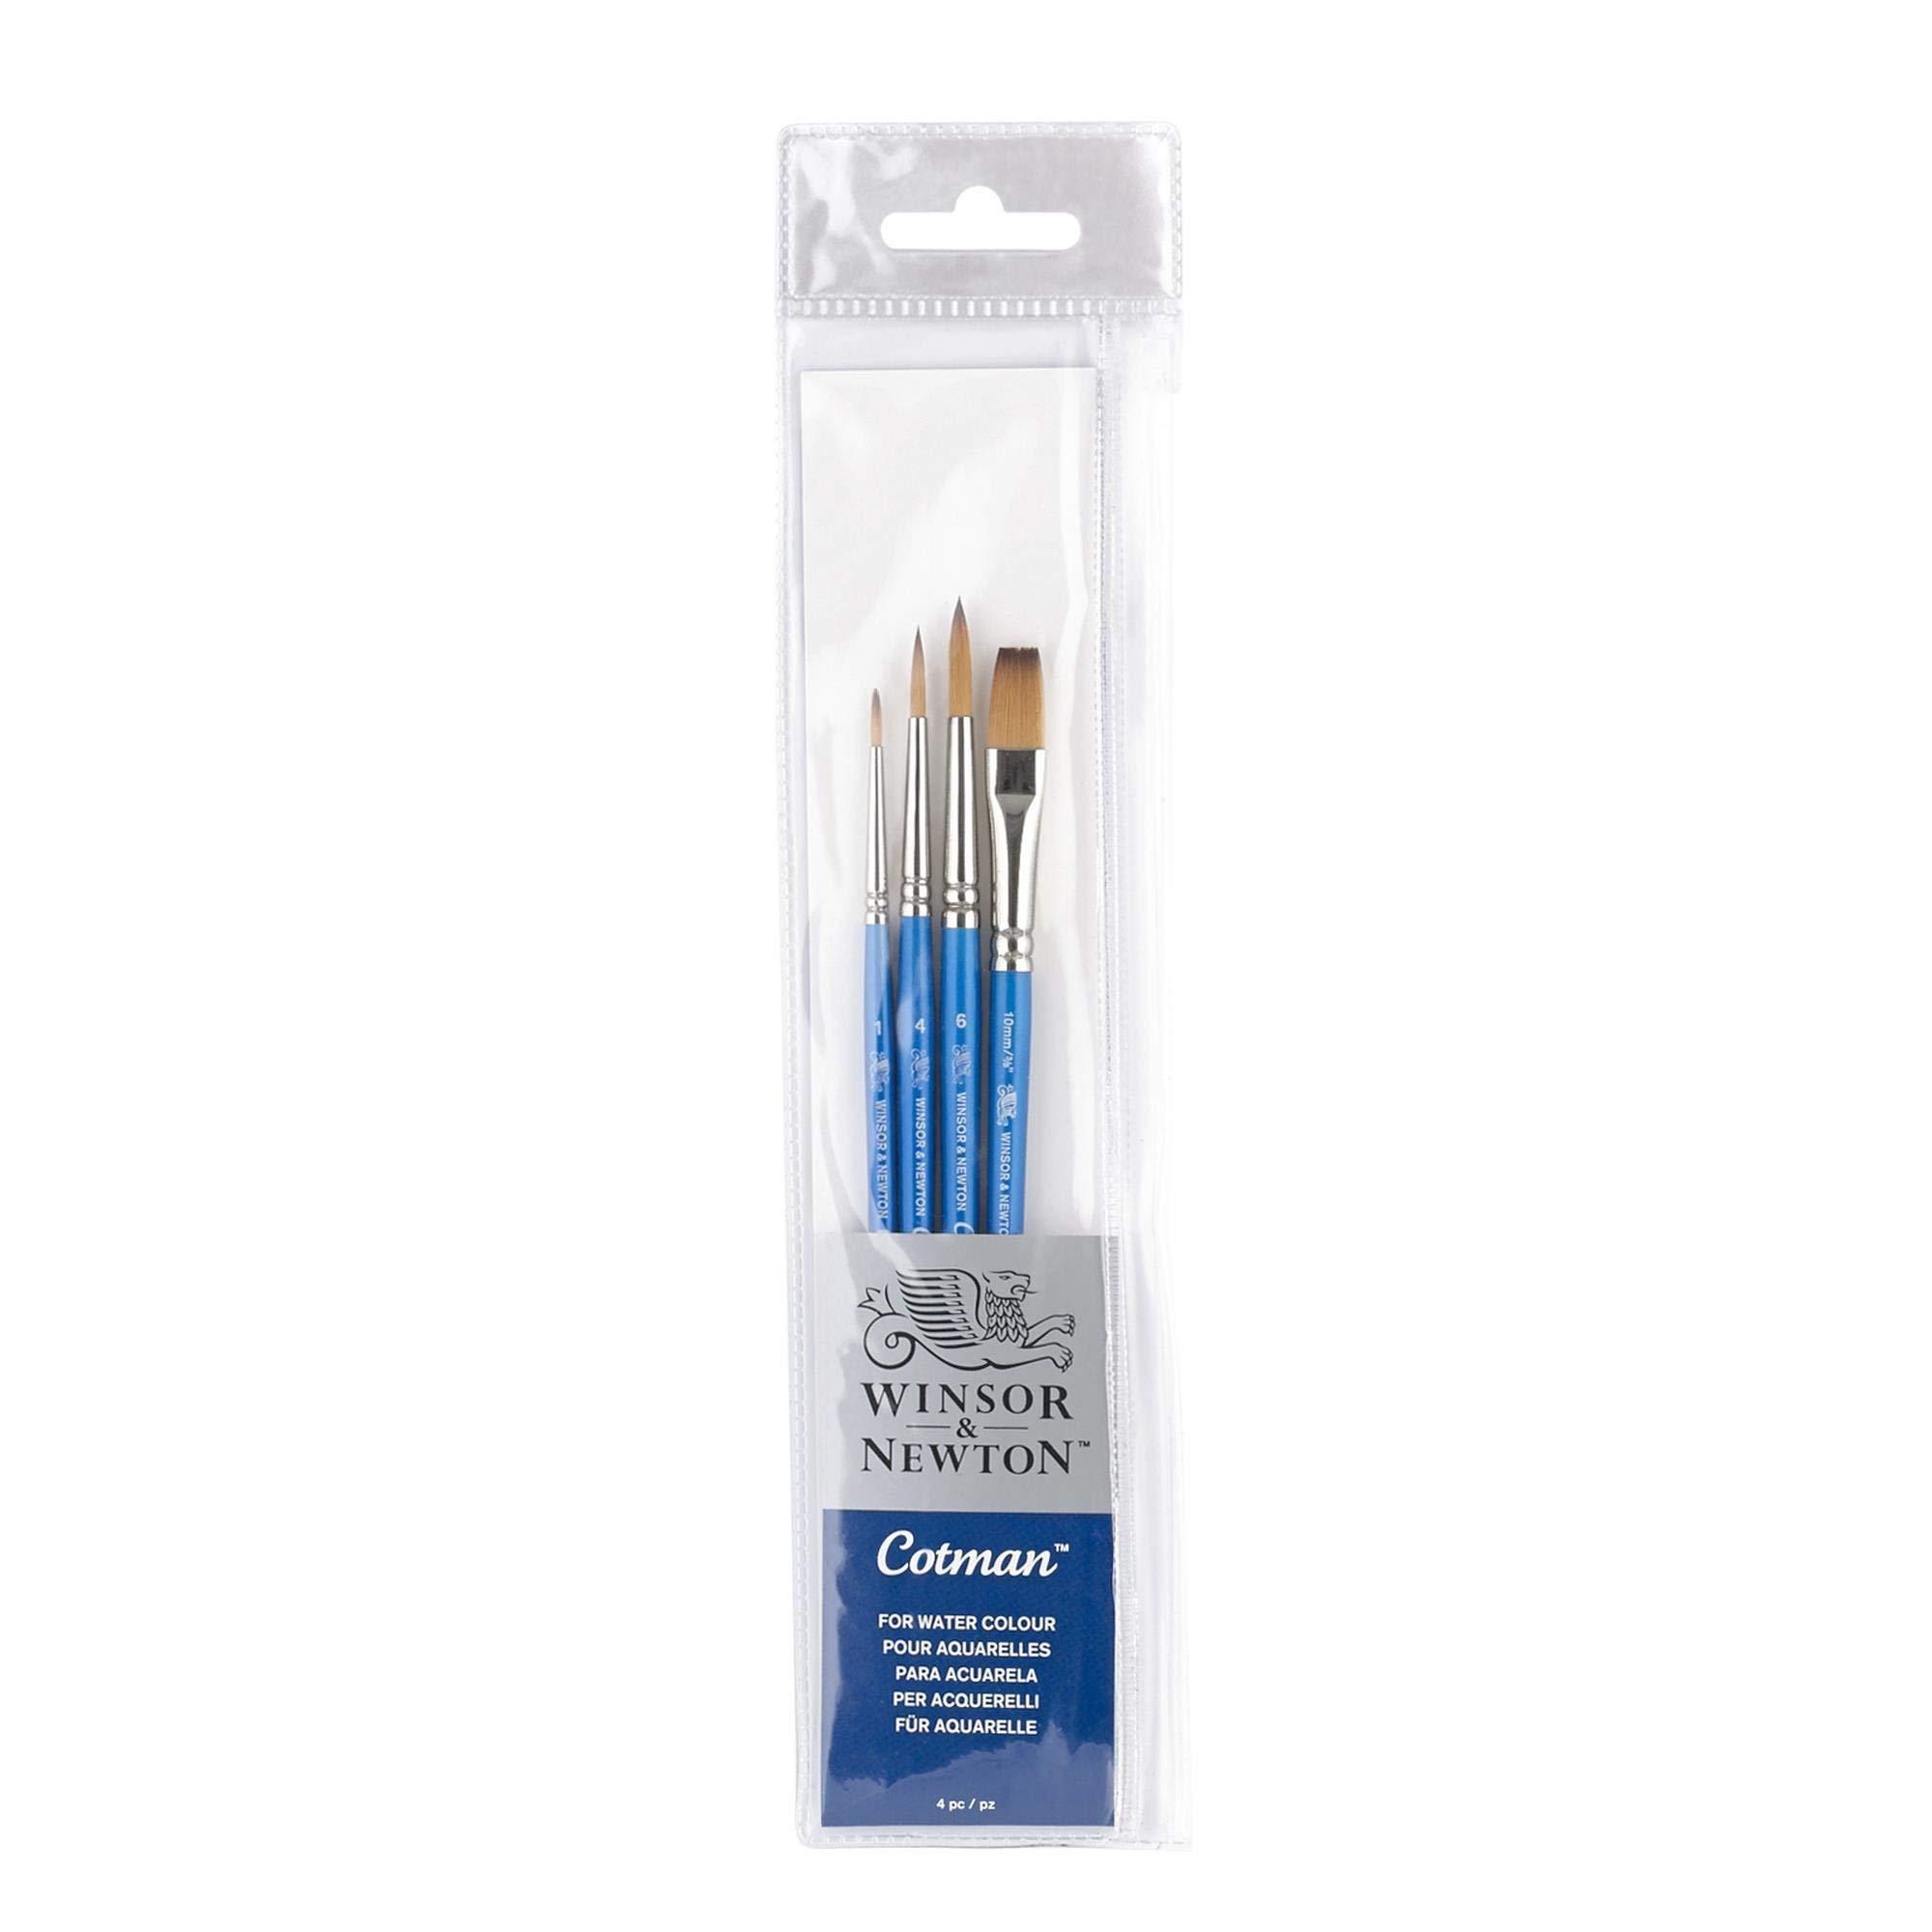 Winsor & Newton Cotman Short Handle Brush (4 Pack) (Round 1, 4, & 6, One Stroke 3/8'') by Winsor & Newton